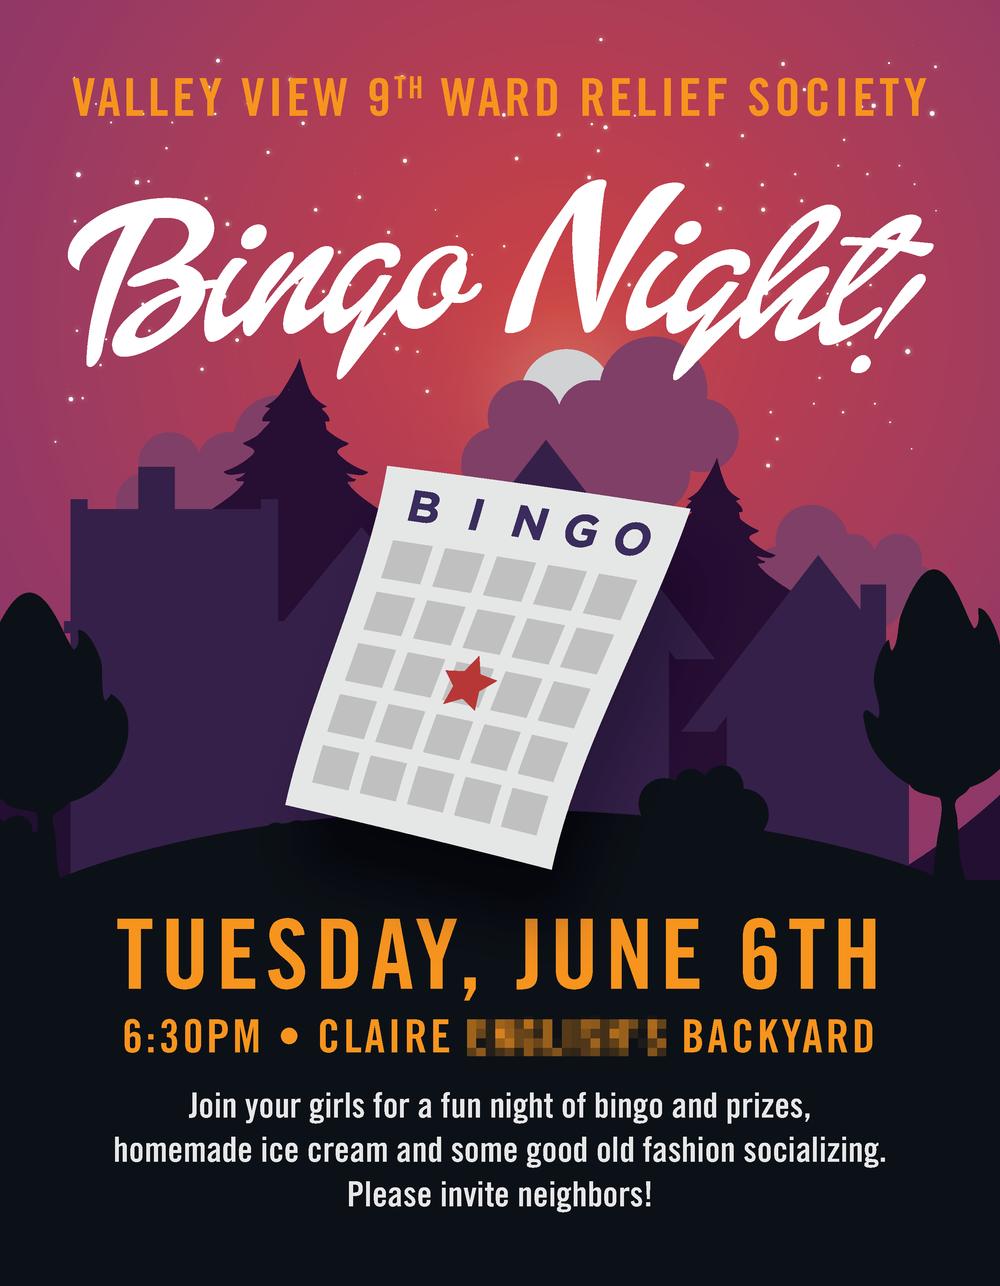 LisaStebbing_Bingo-Night_20170525_Page_1.png